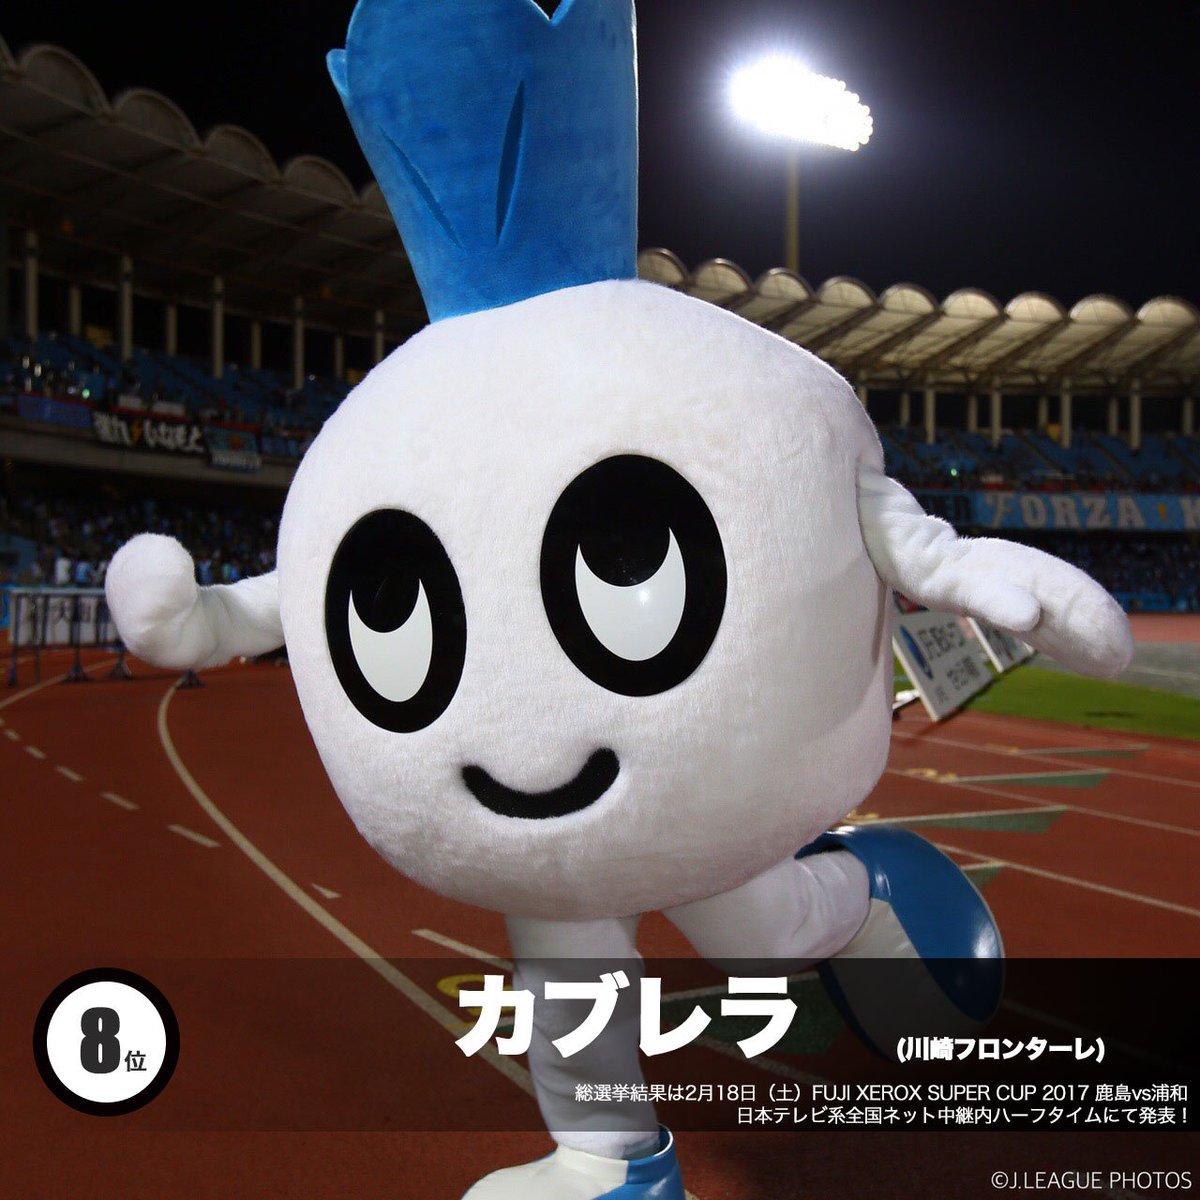 🏅#Jマスコット総選挙 結果発表🎖  🎖 8位:カブレラ ⚽️ 川崎フロンターレ  #Jリーグ開幕 …